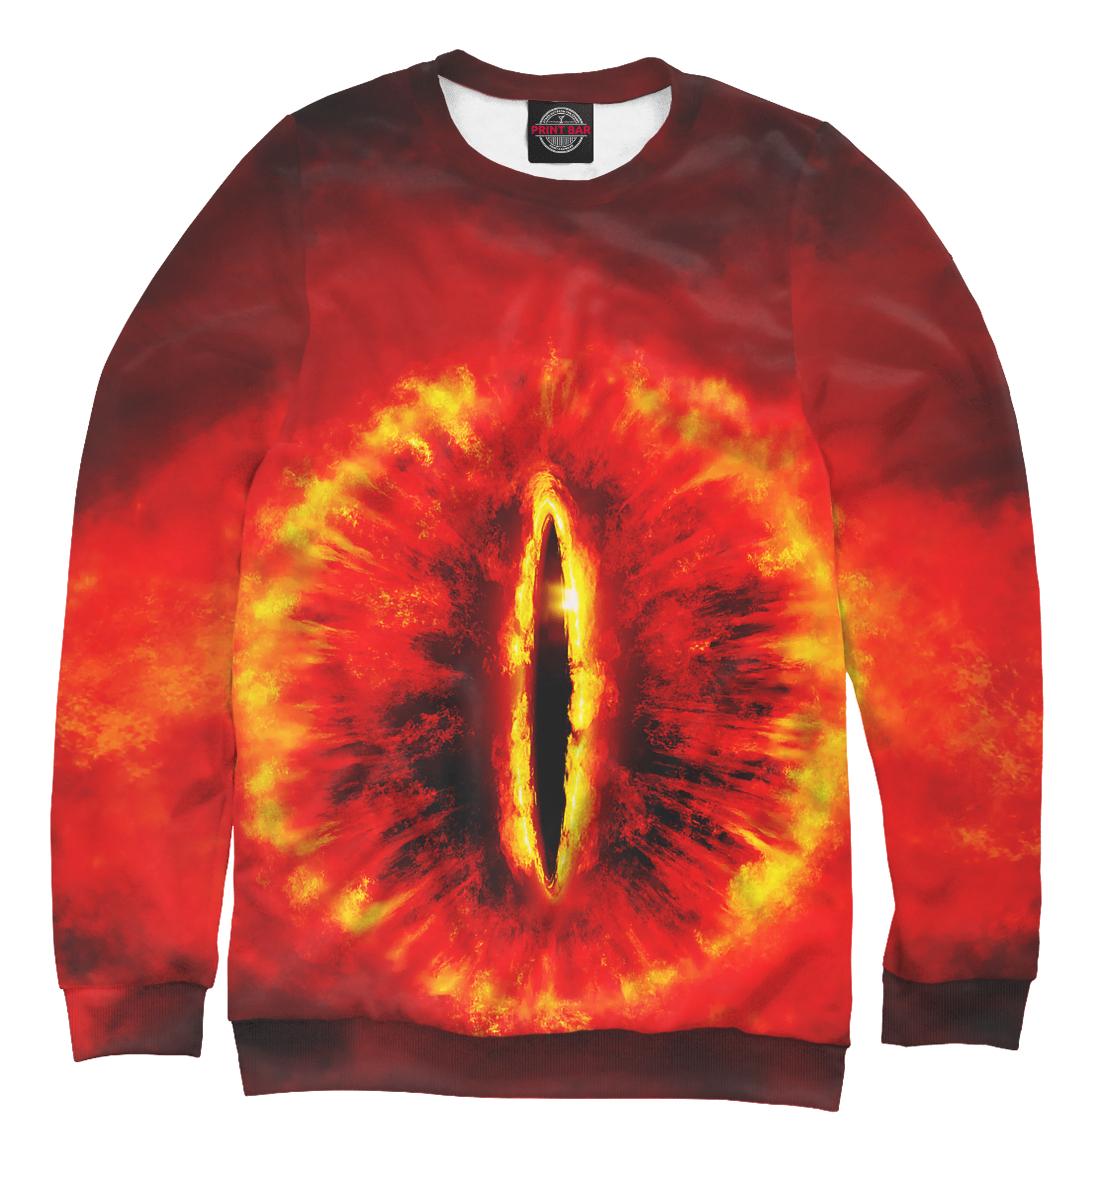 Купить Глаз Саурона, Printbar, Свитшоты, KNO-559151-swi-2